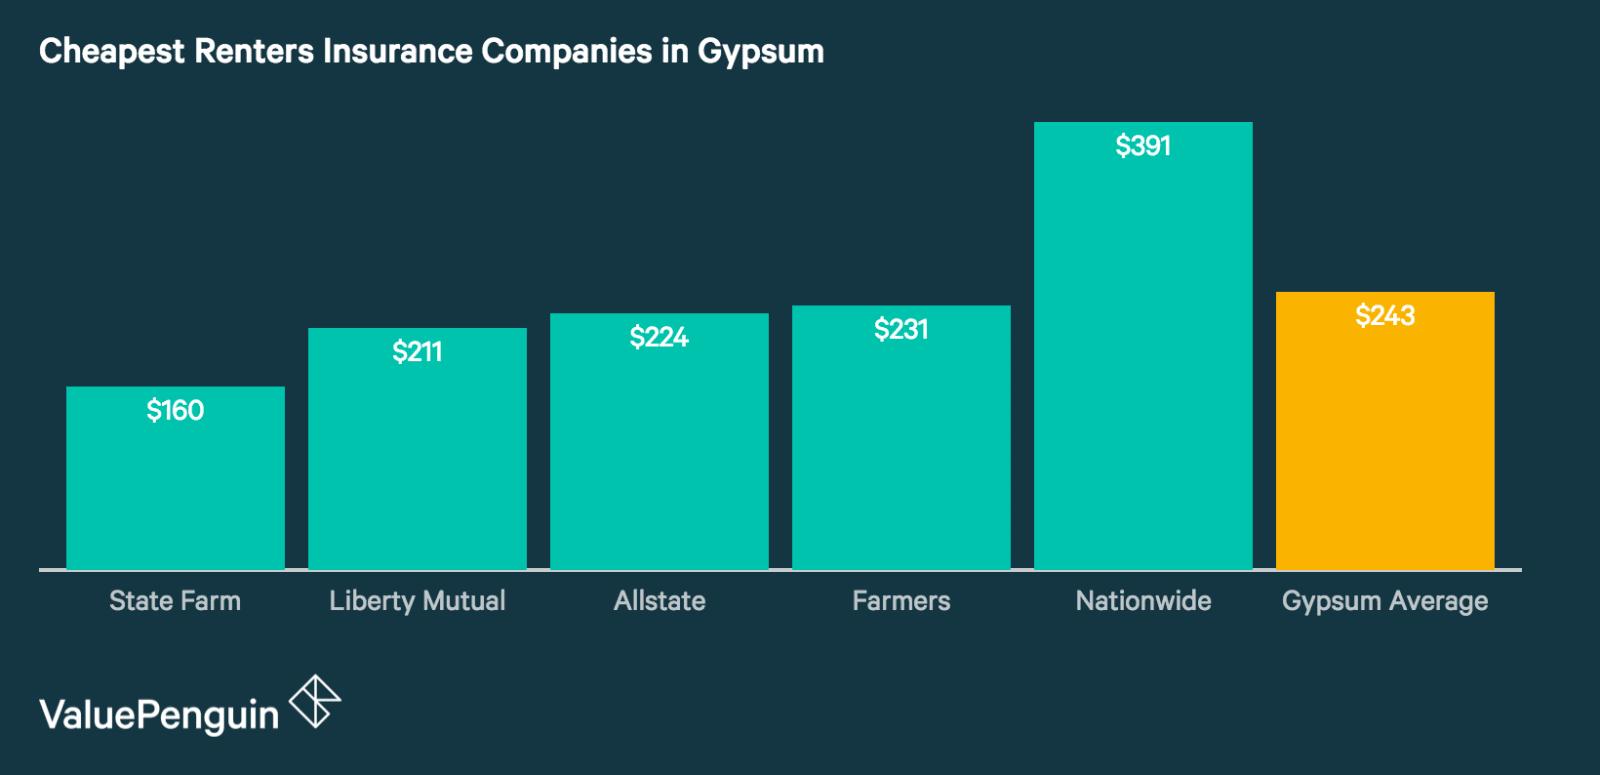 Average Renters Insurance Premiums in Gypsum